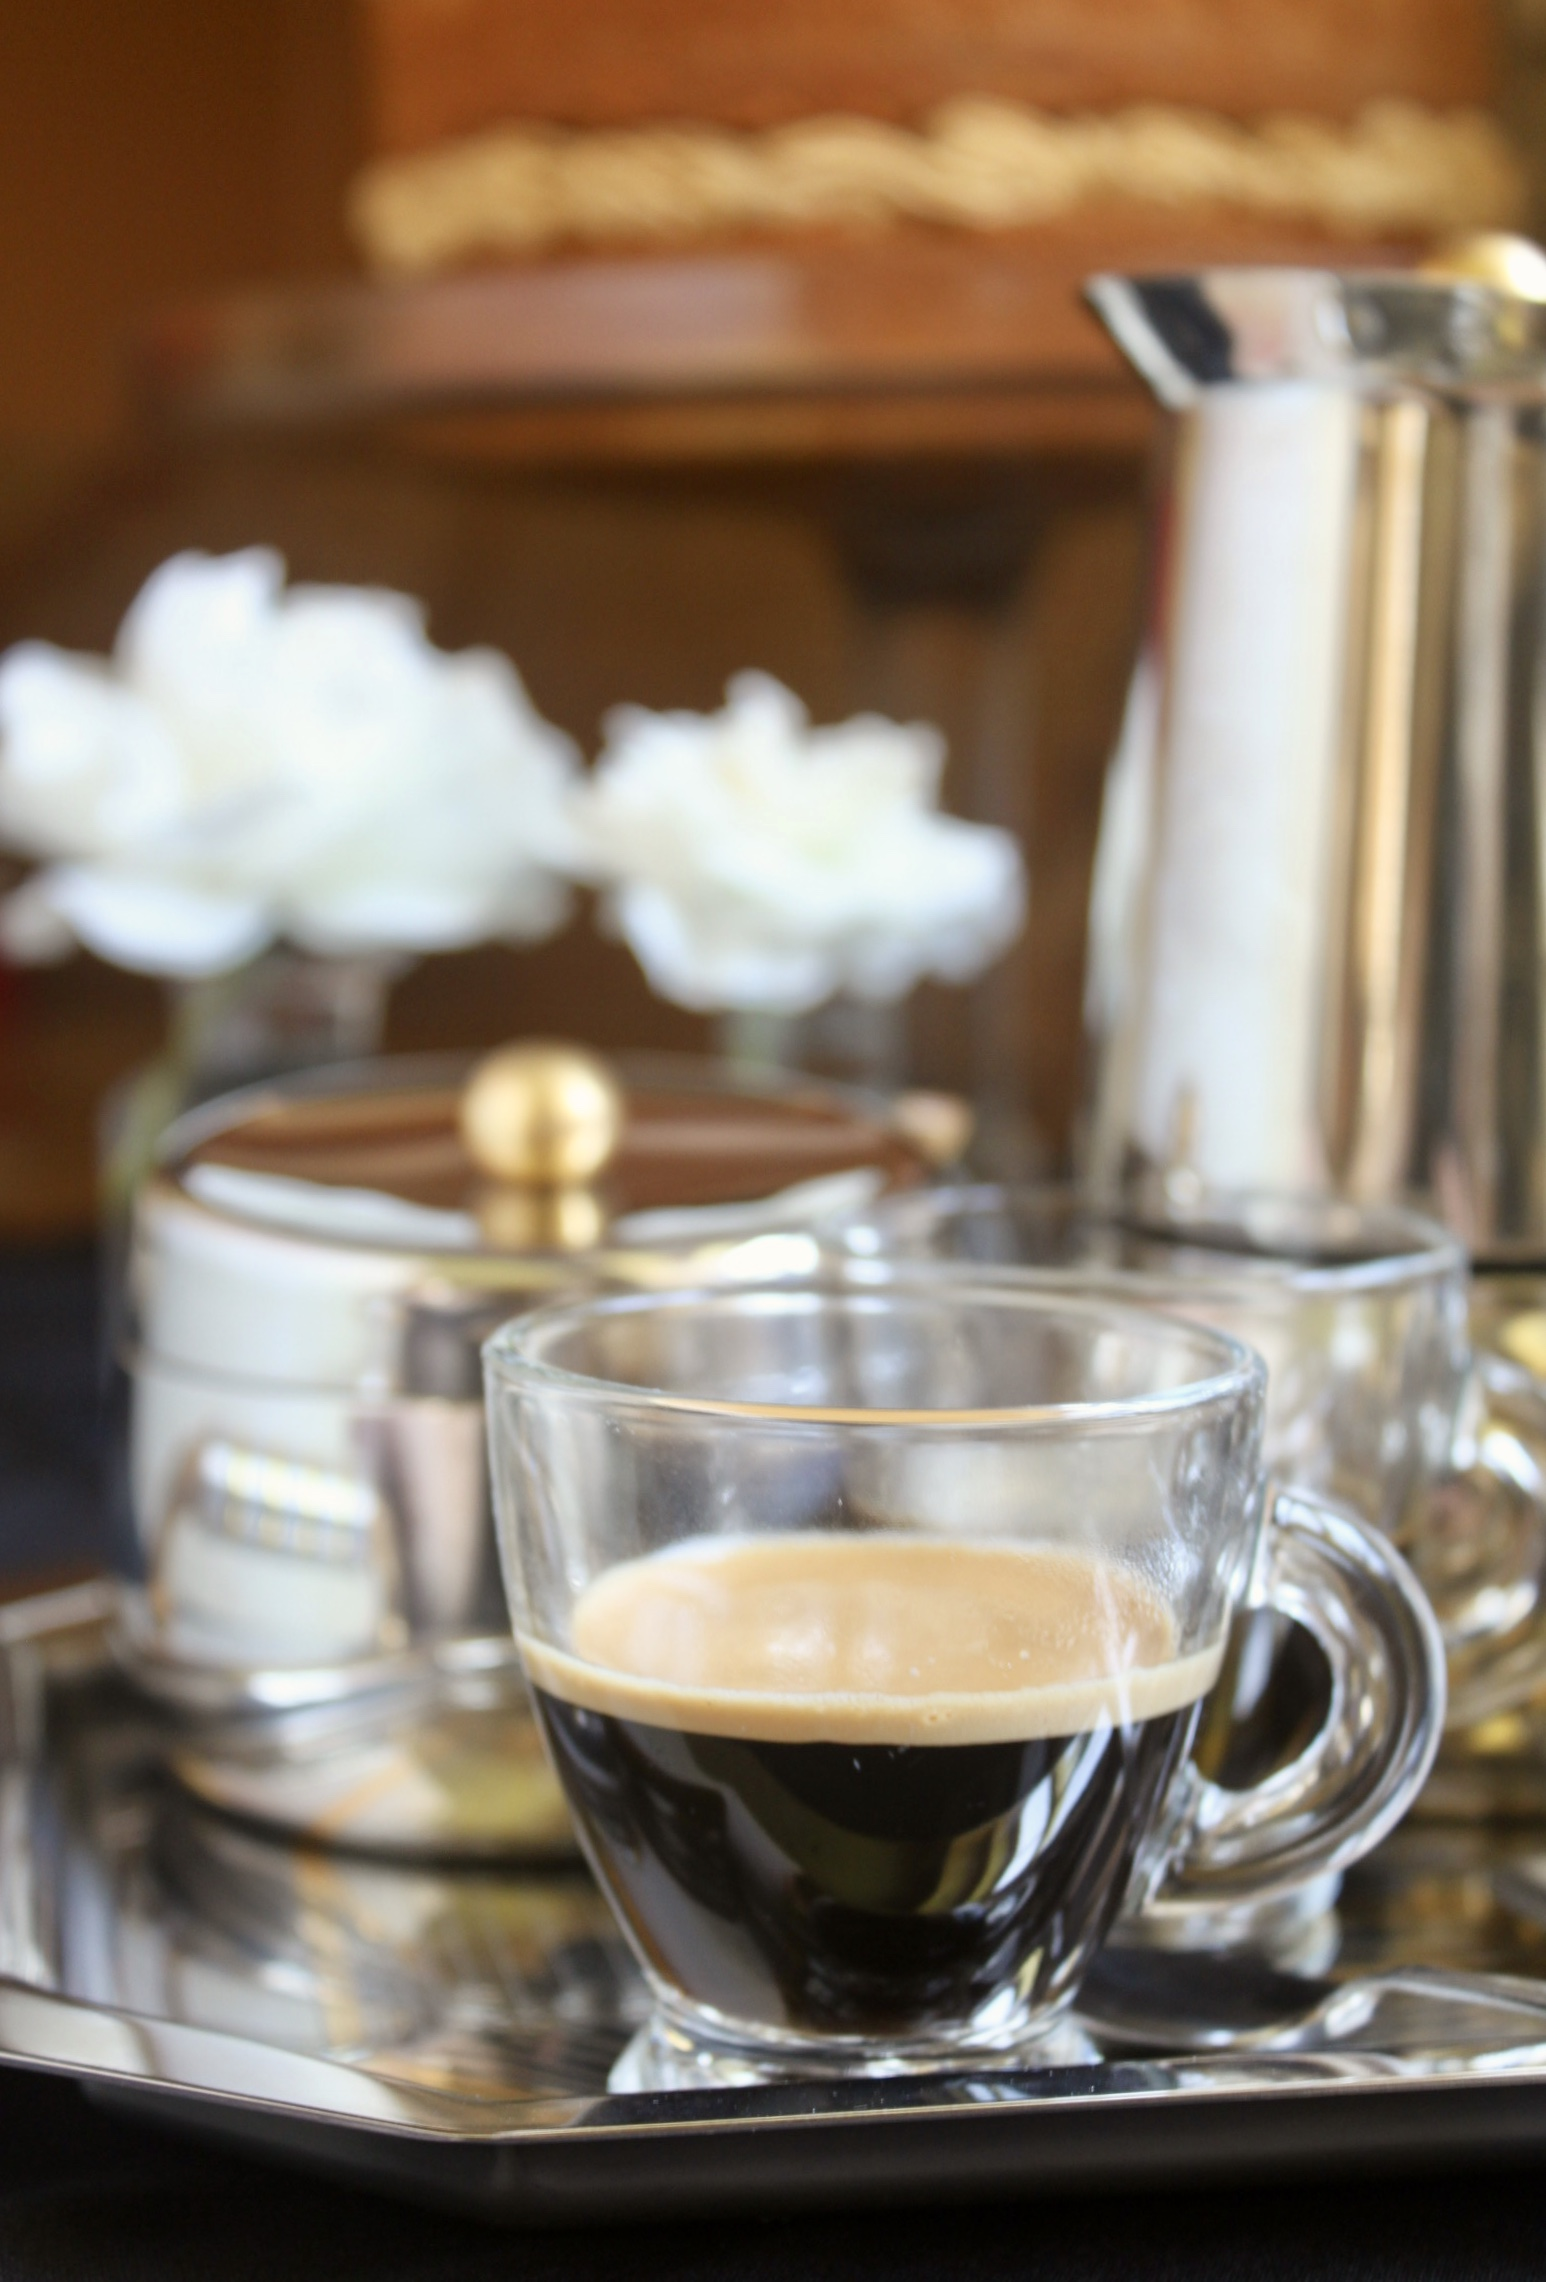 Coffee and Walnut Cake, a Classic British Cake for Afternoon Tea - Christina's Cucina